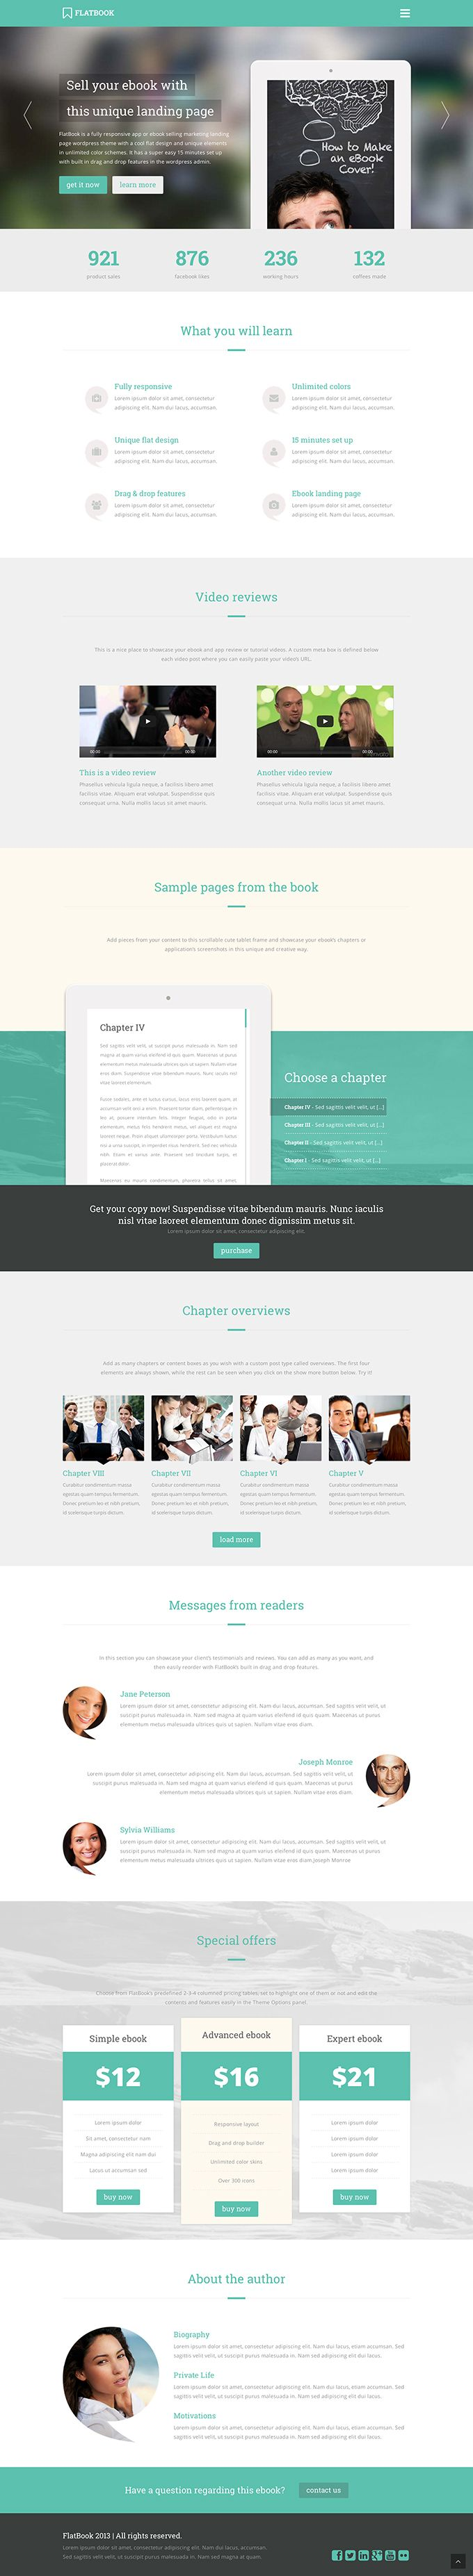 FlatBook - a marketing theme for WordPress